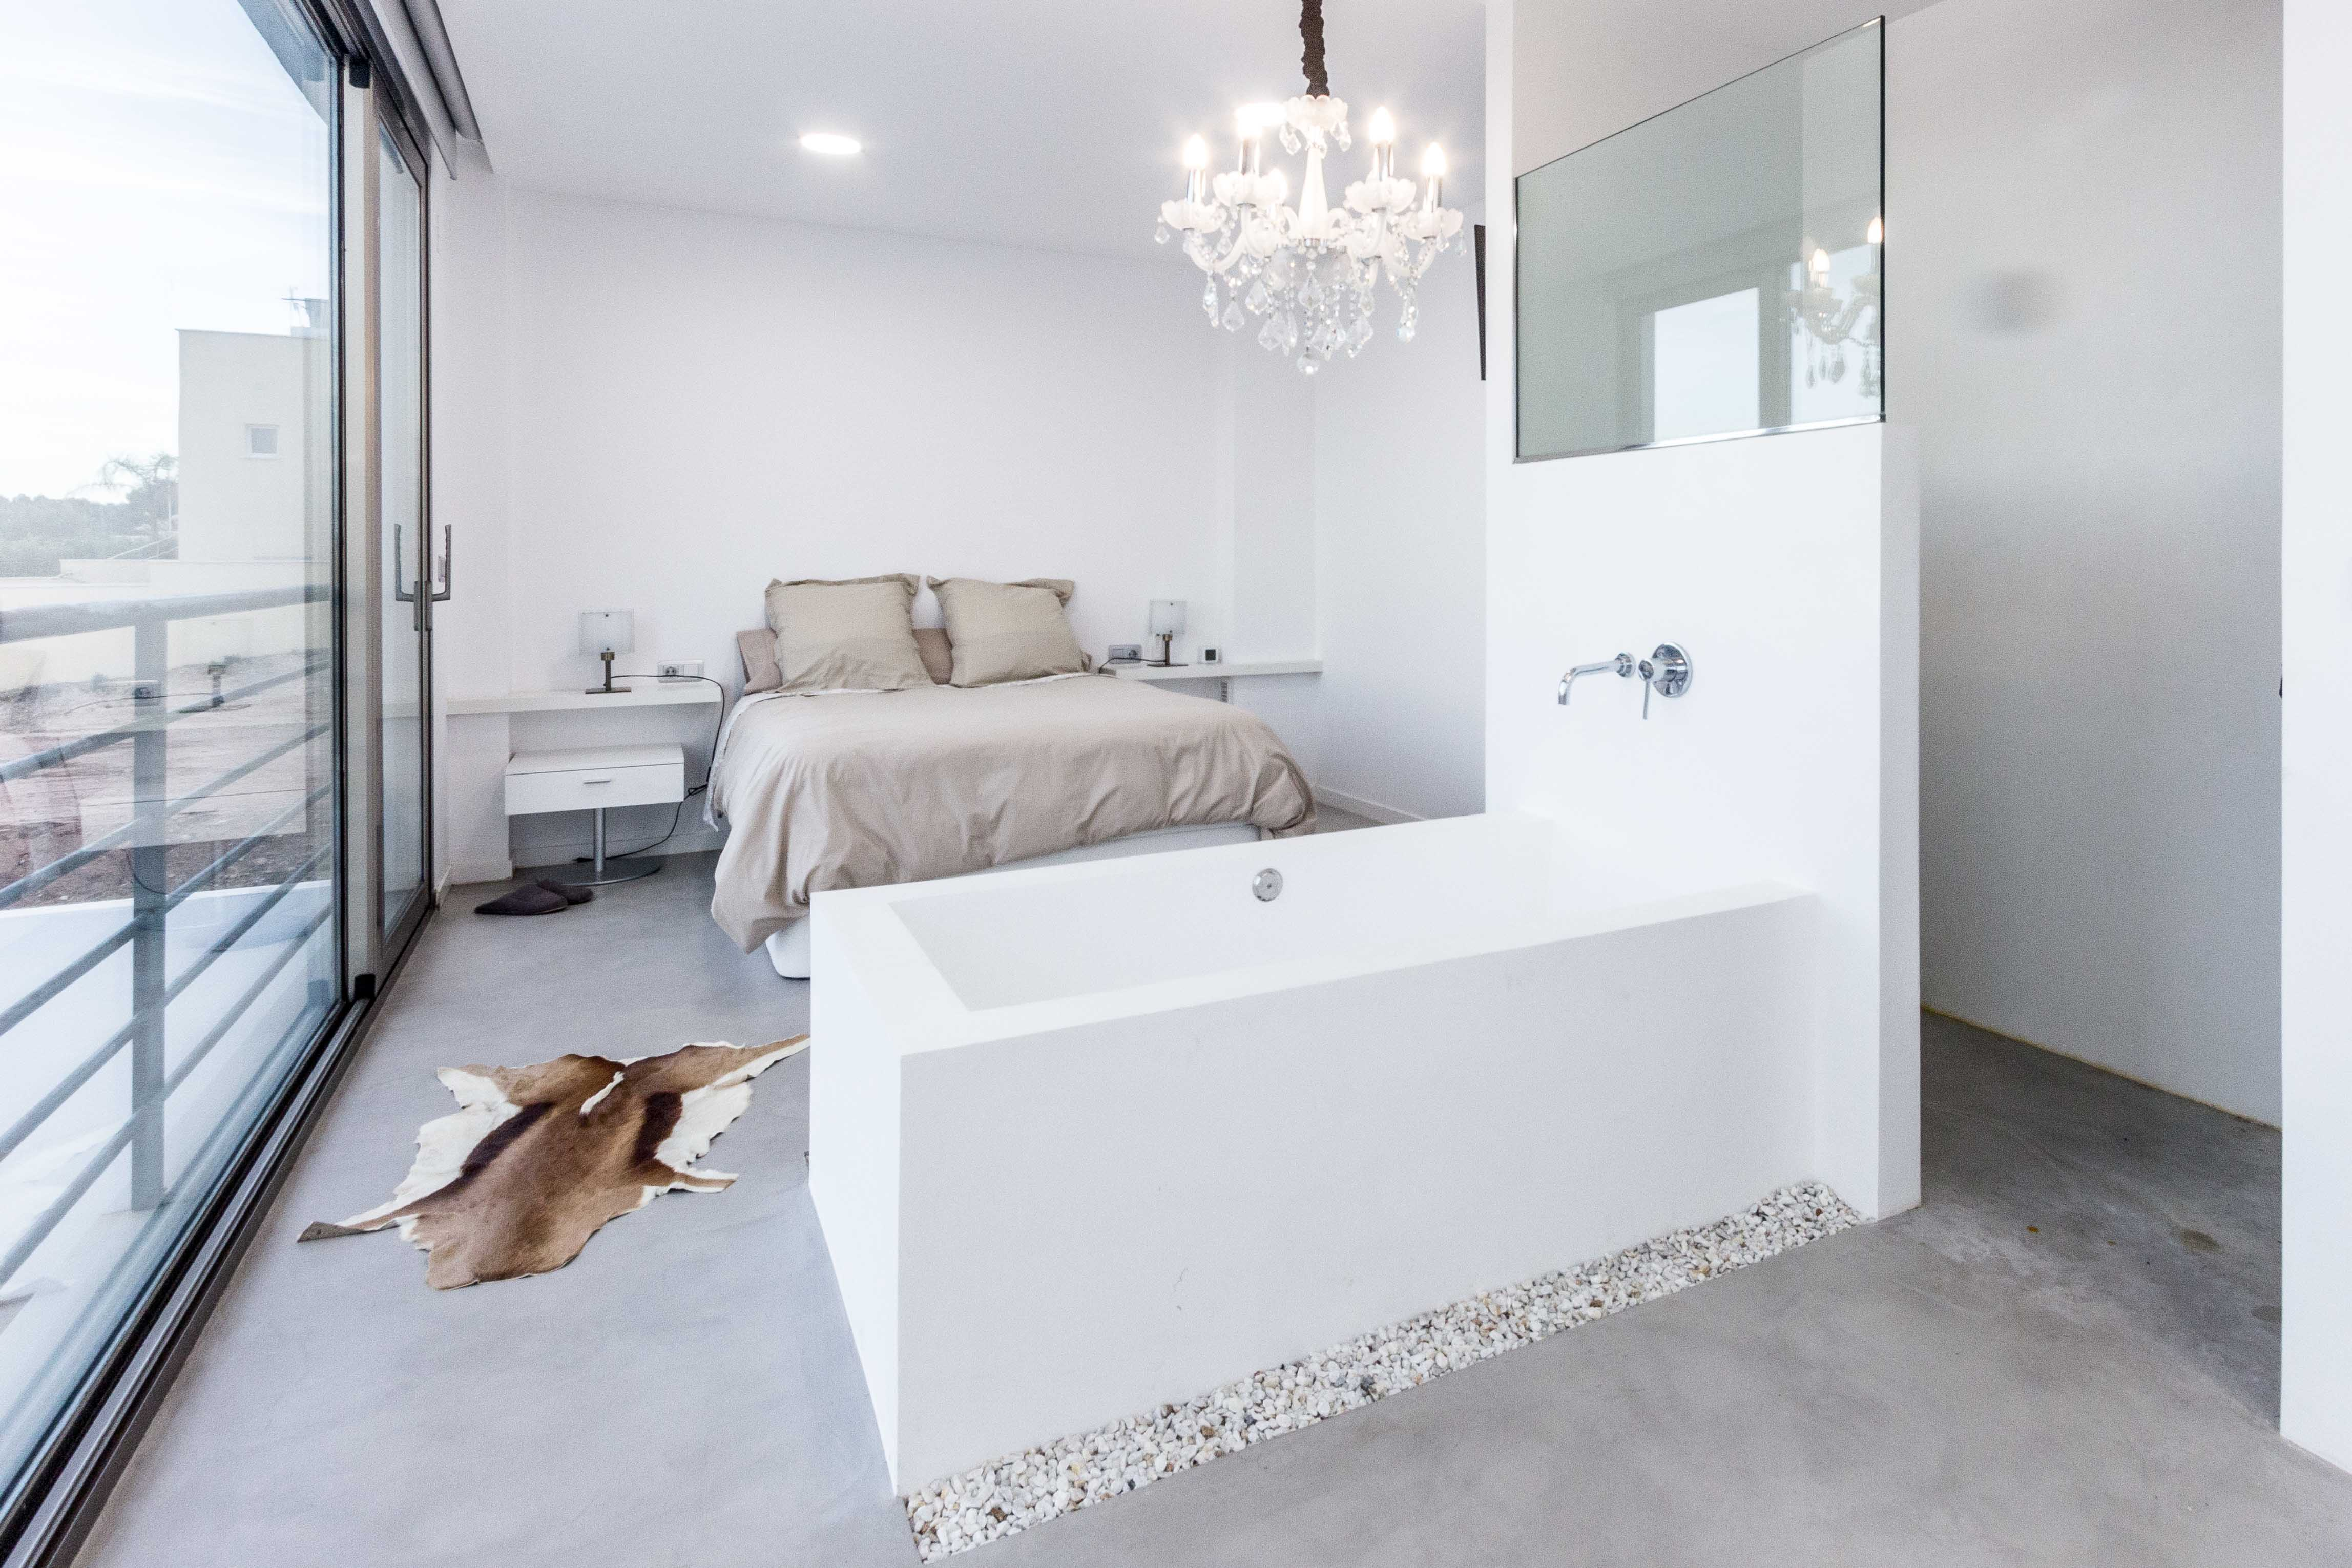 Bañera de microcemento blanco en dormitorio en casa mediterranea. Chiralt arquitectos Valencia.